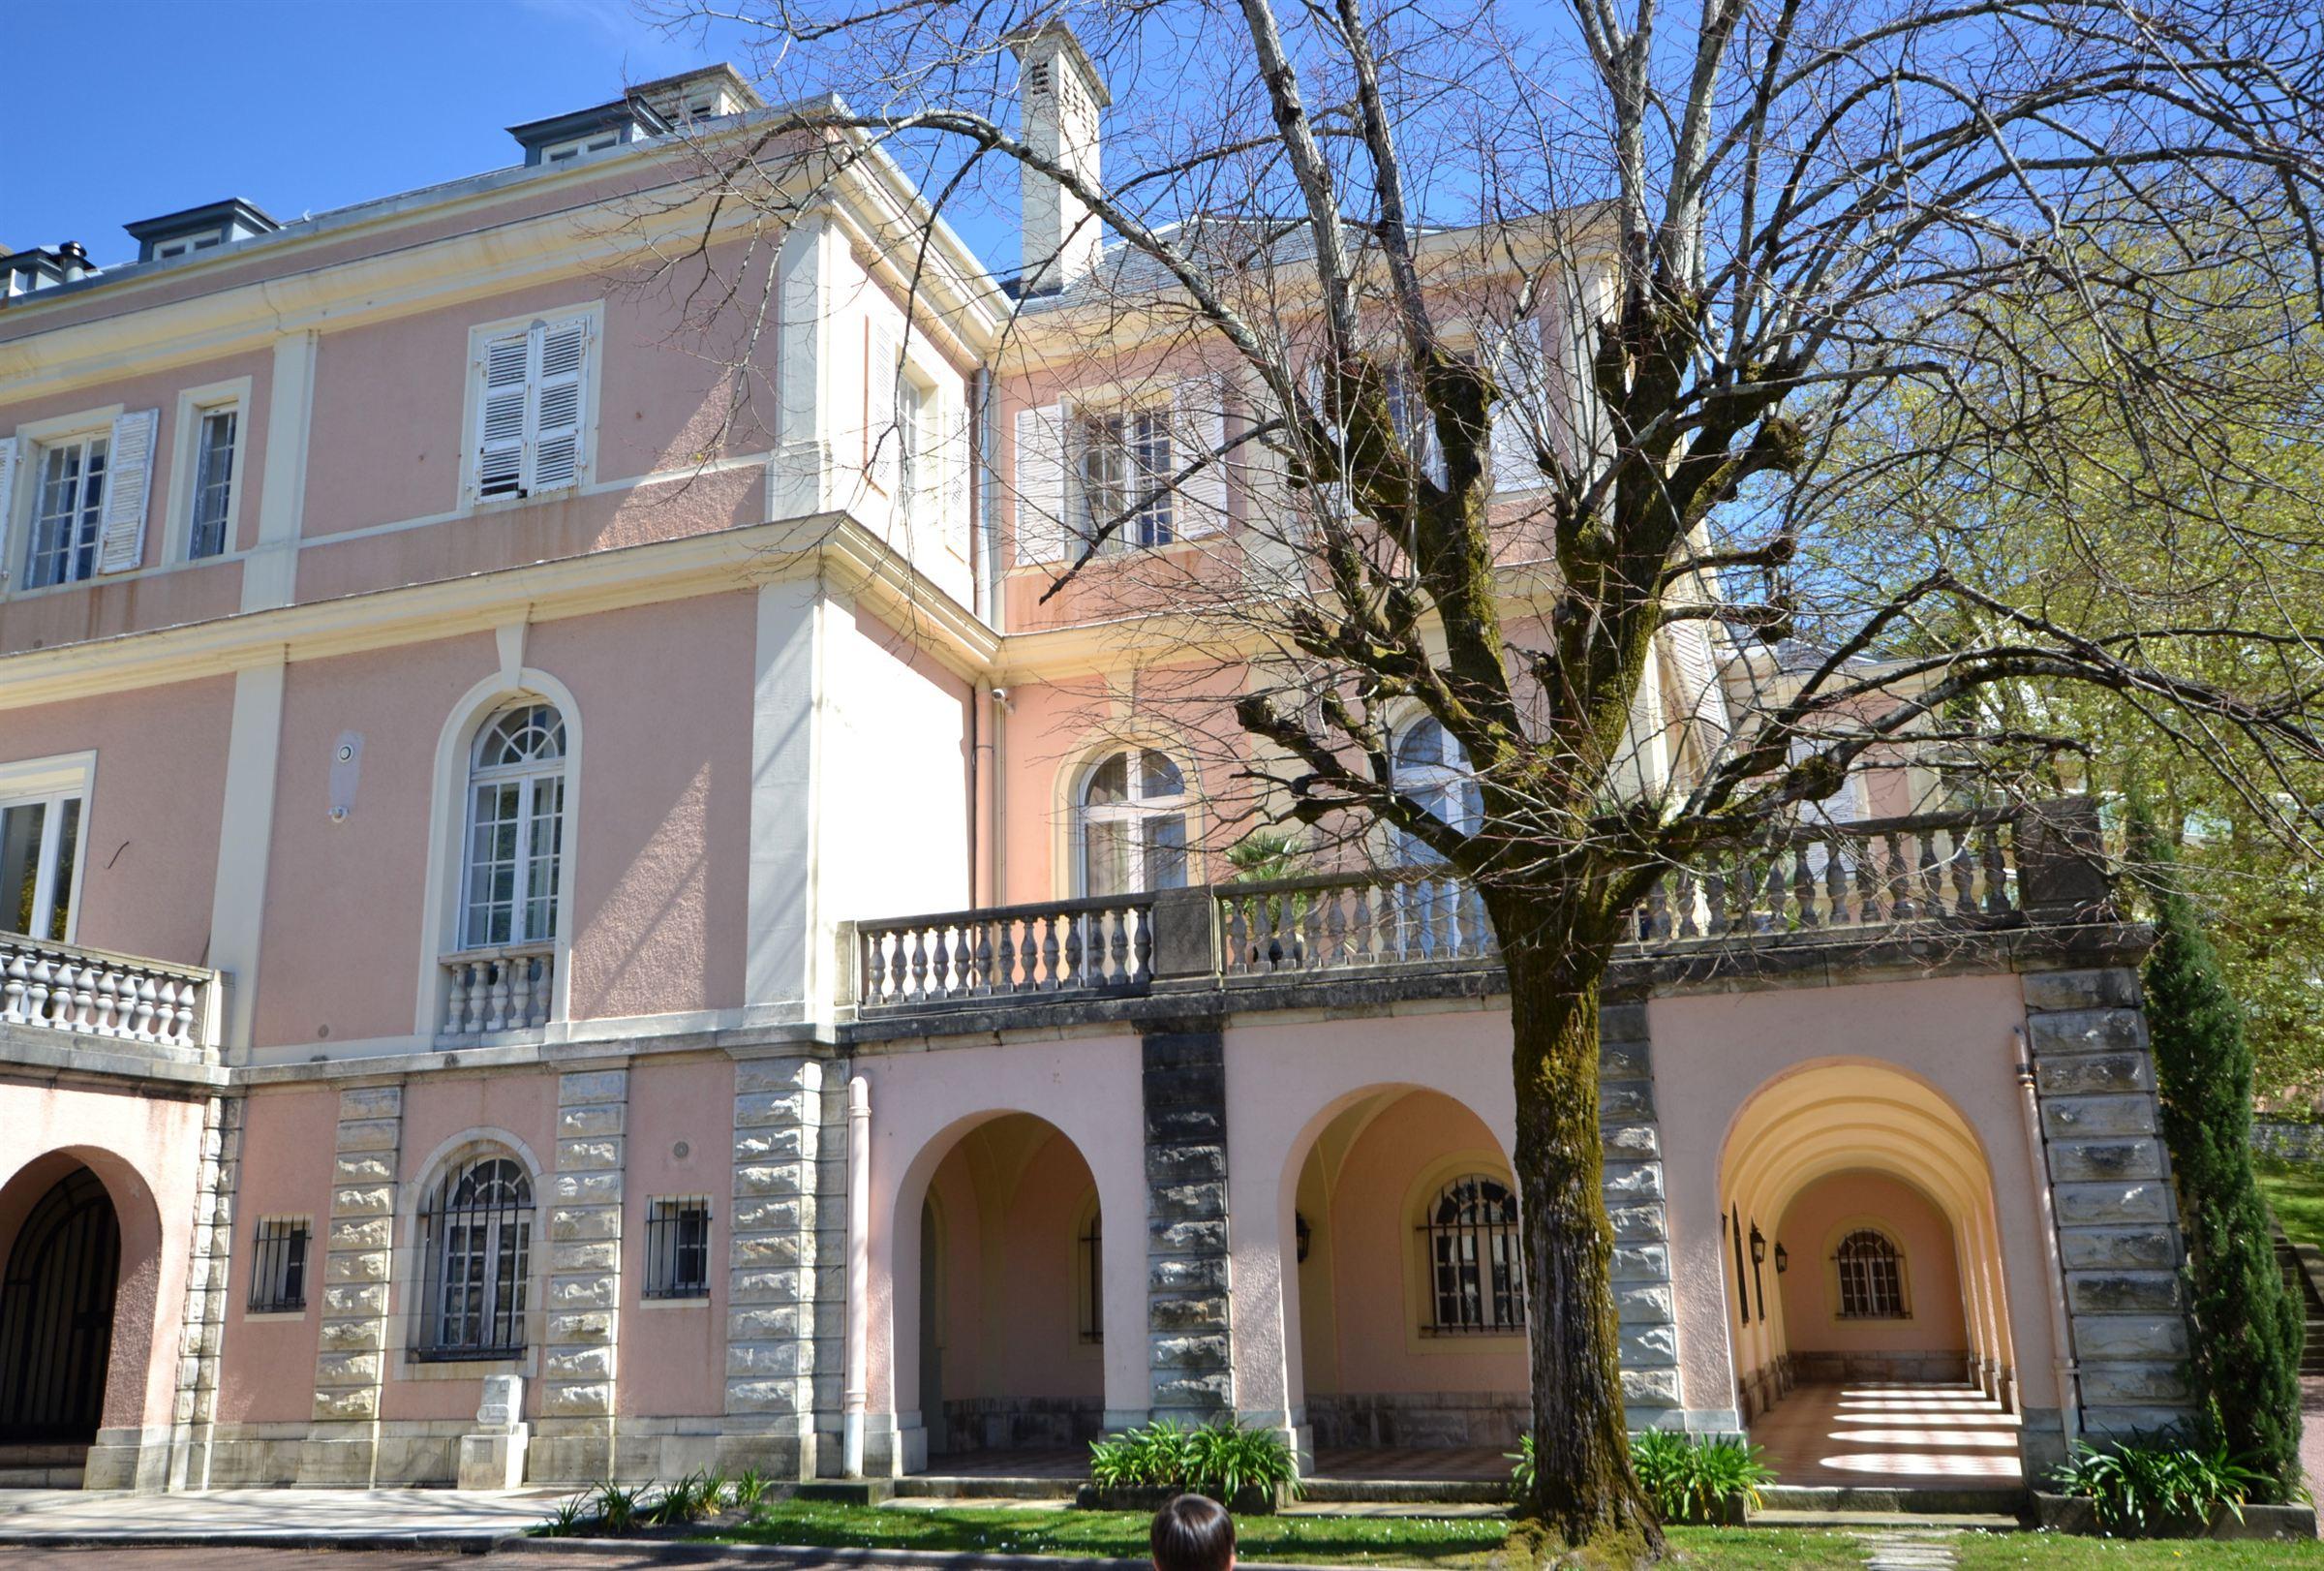 Apartment for Sale at BIARRITZ SAINT CHARLES Biarritz, Aquitaine, 64200 France